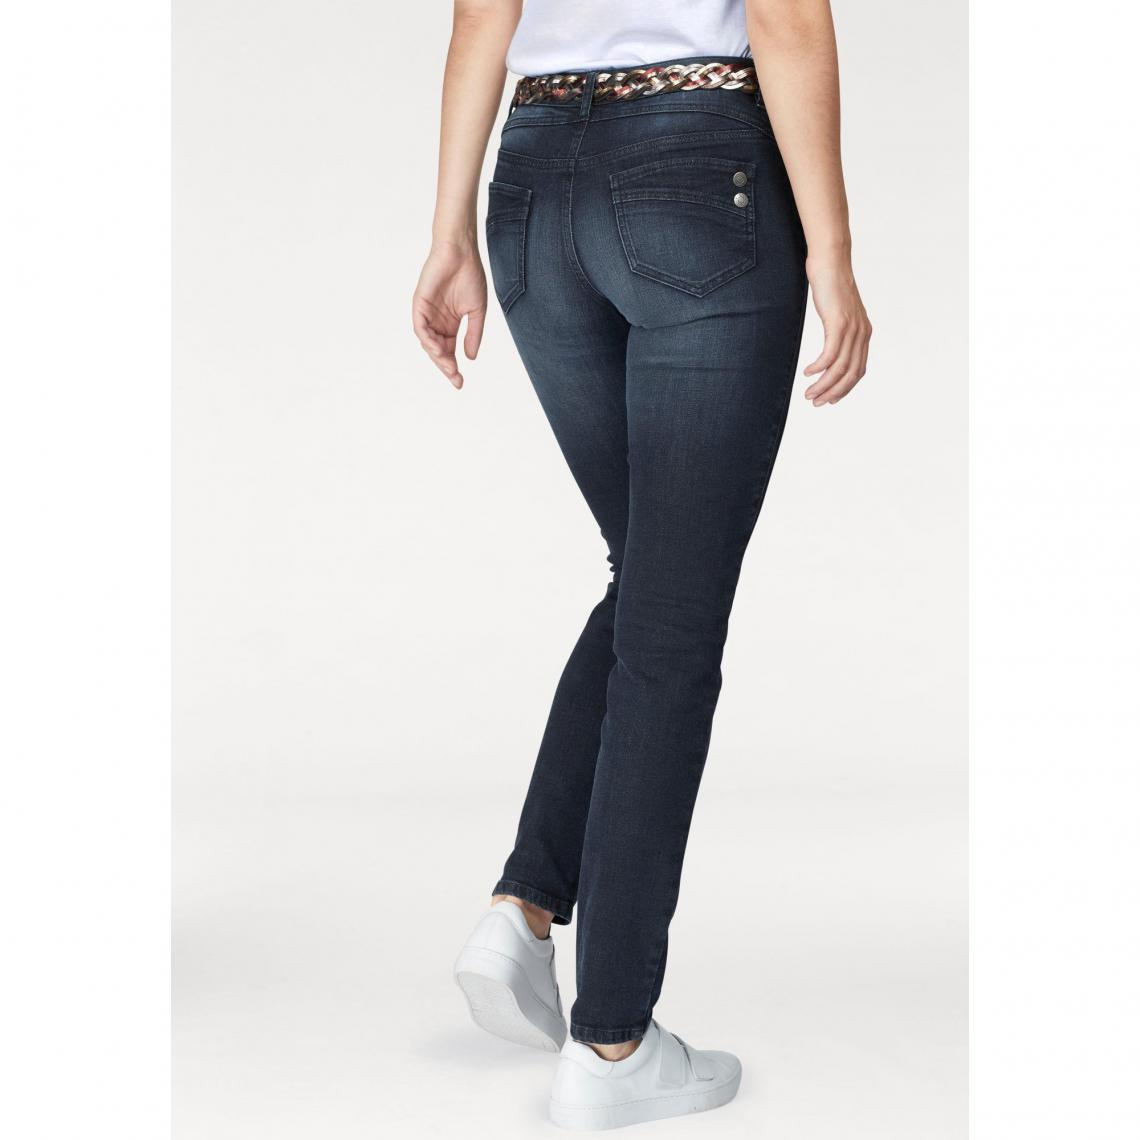 taille 40 c1e2f b30bb Jean slim taille haute femme AJC - Foncé Used 1 Avis